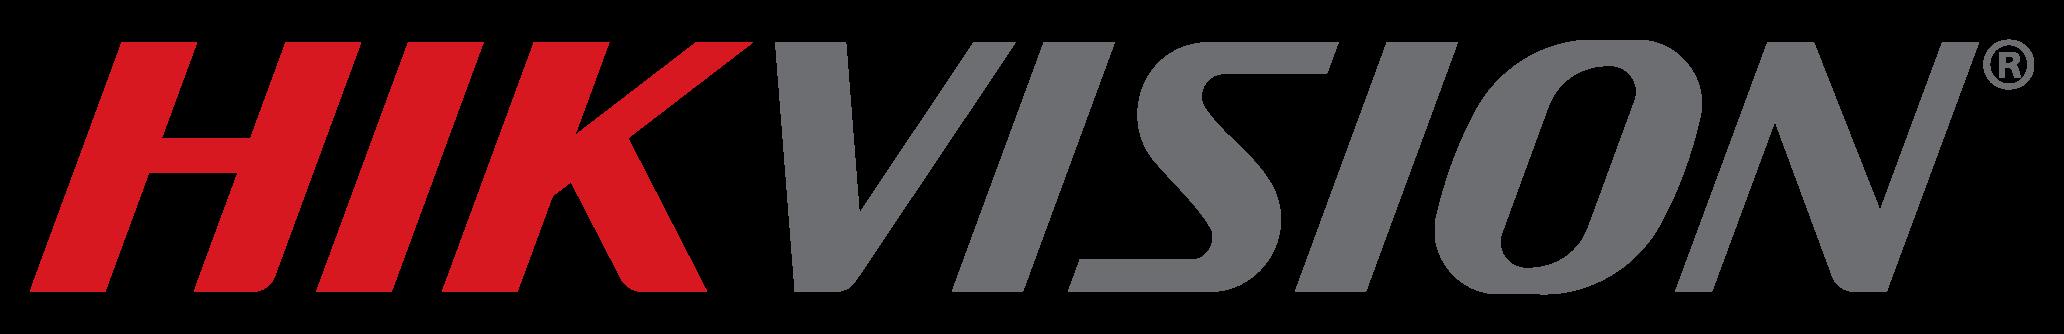 hikvision-logo-Aug-28-2020-10-17-28-47-PM